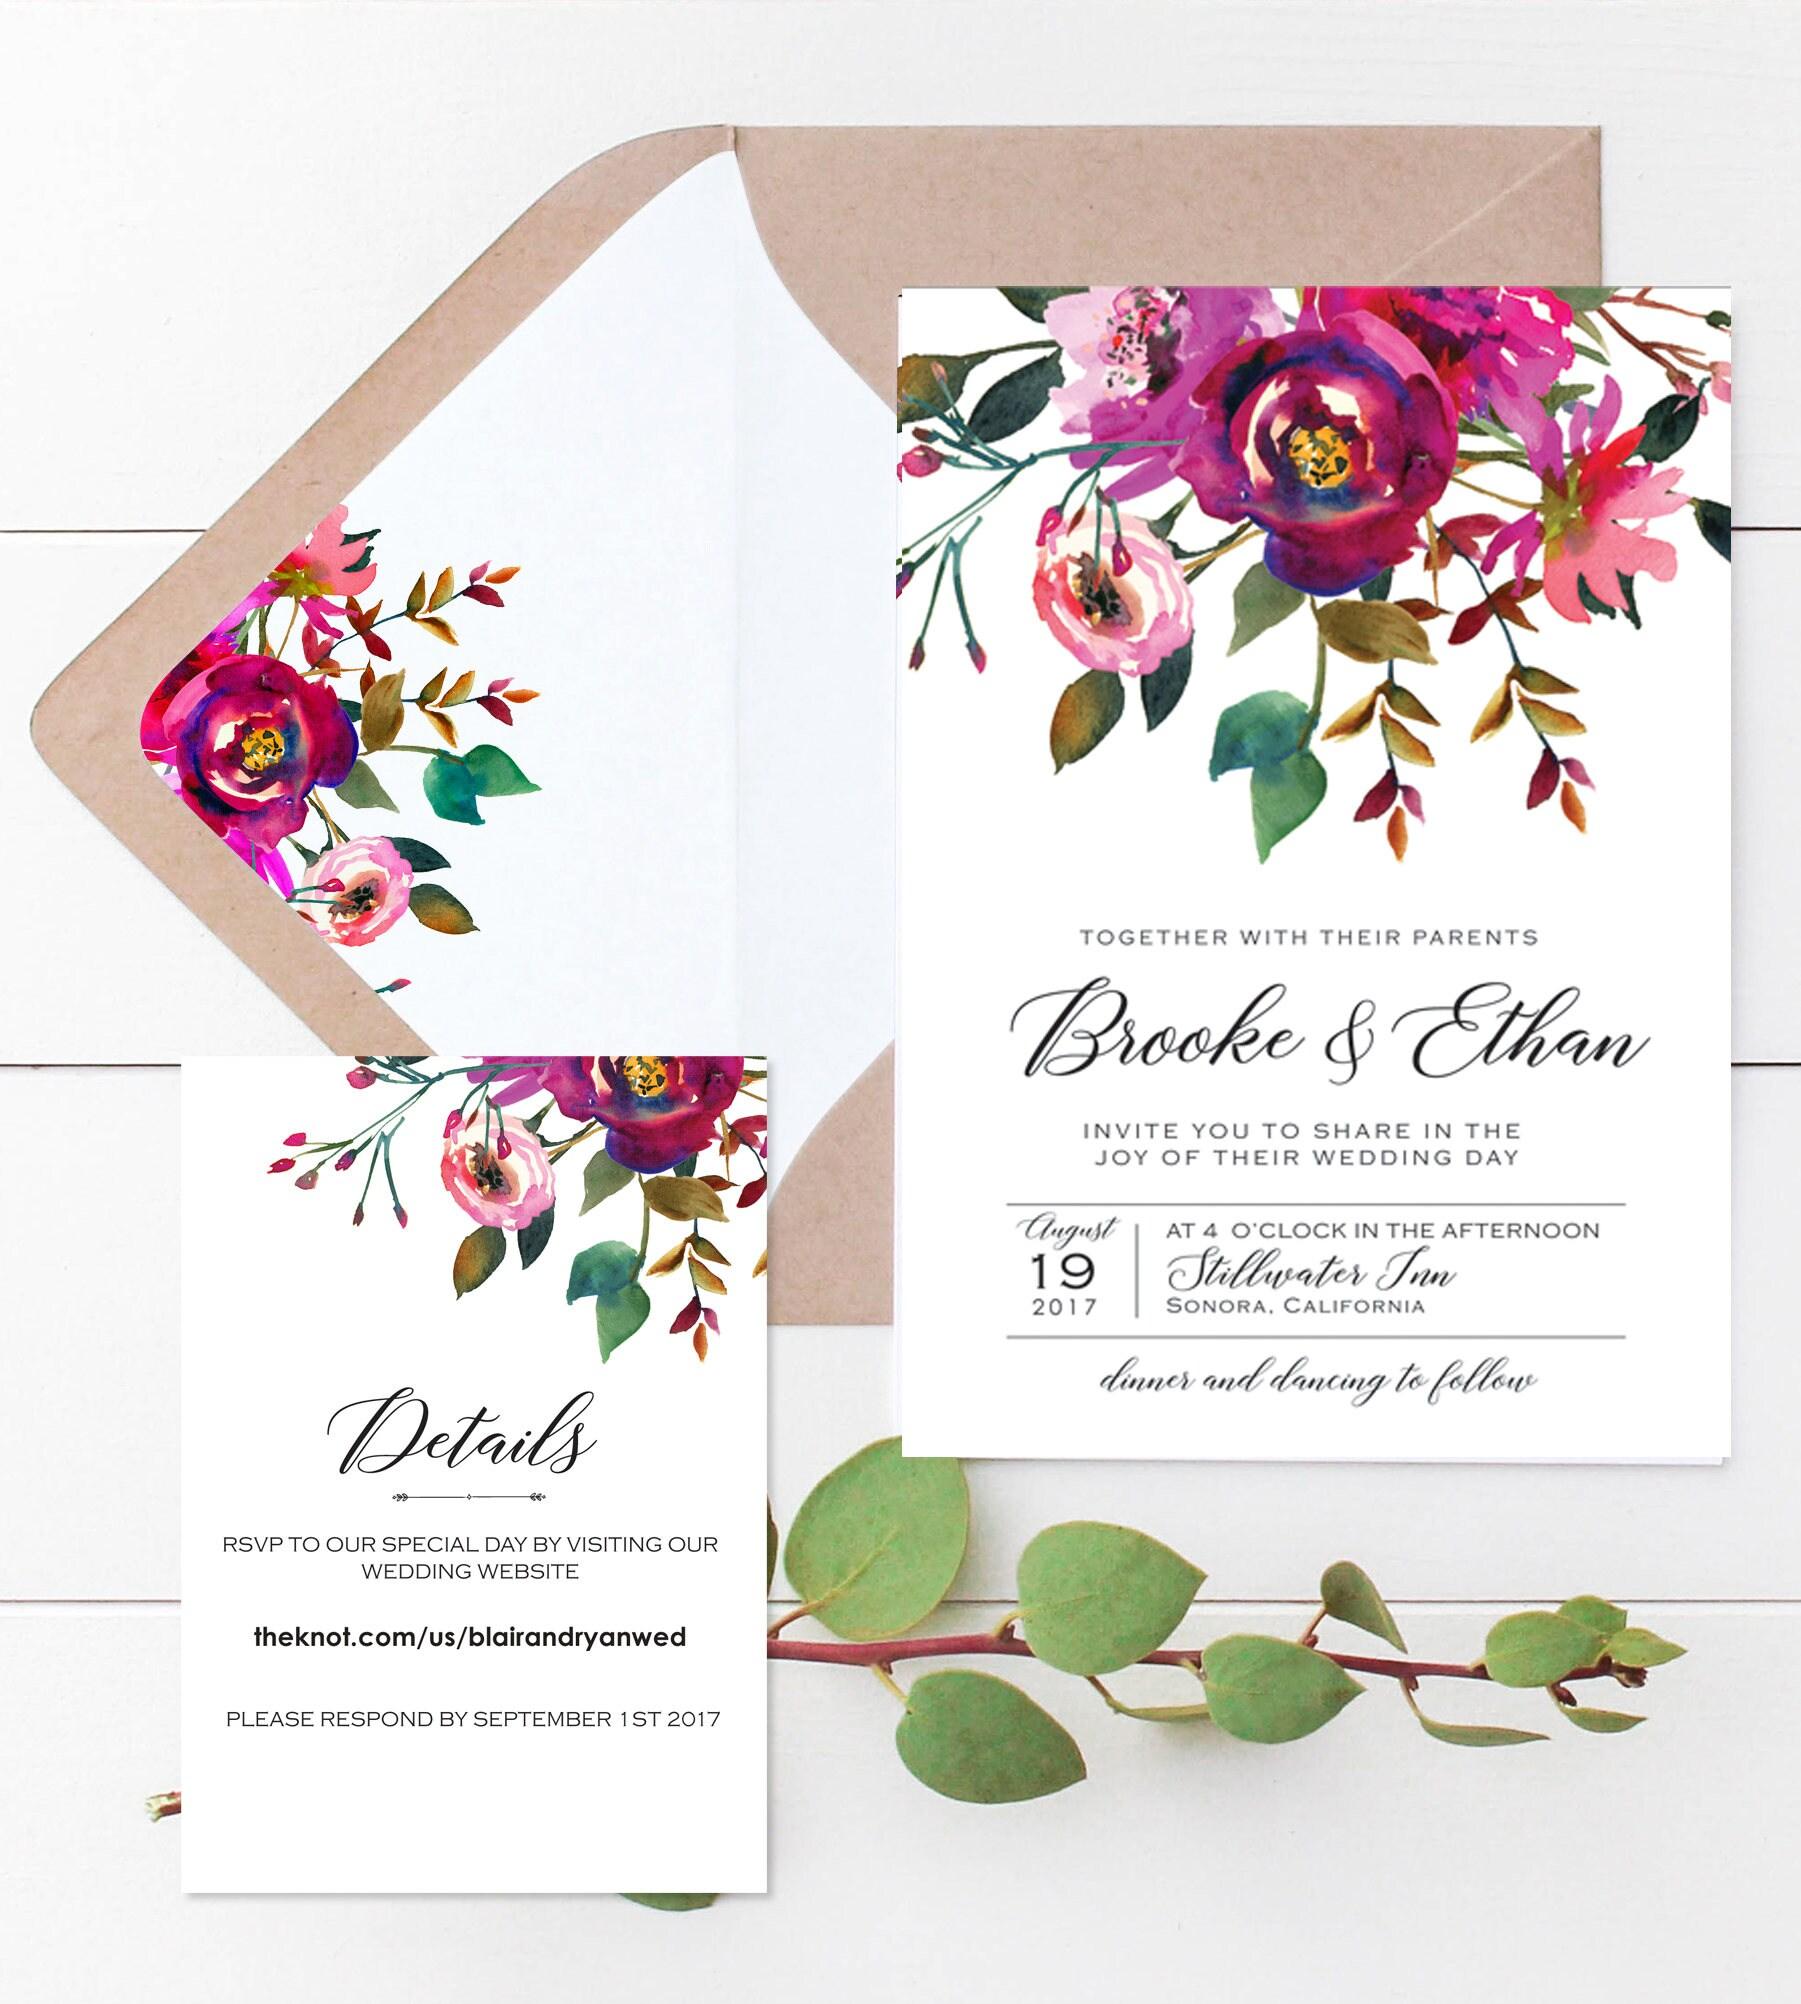 Bohemian Wedding Invitations: Bohemian Wedding Invite Set Floral Wedding Invitations